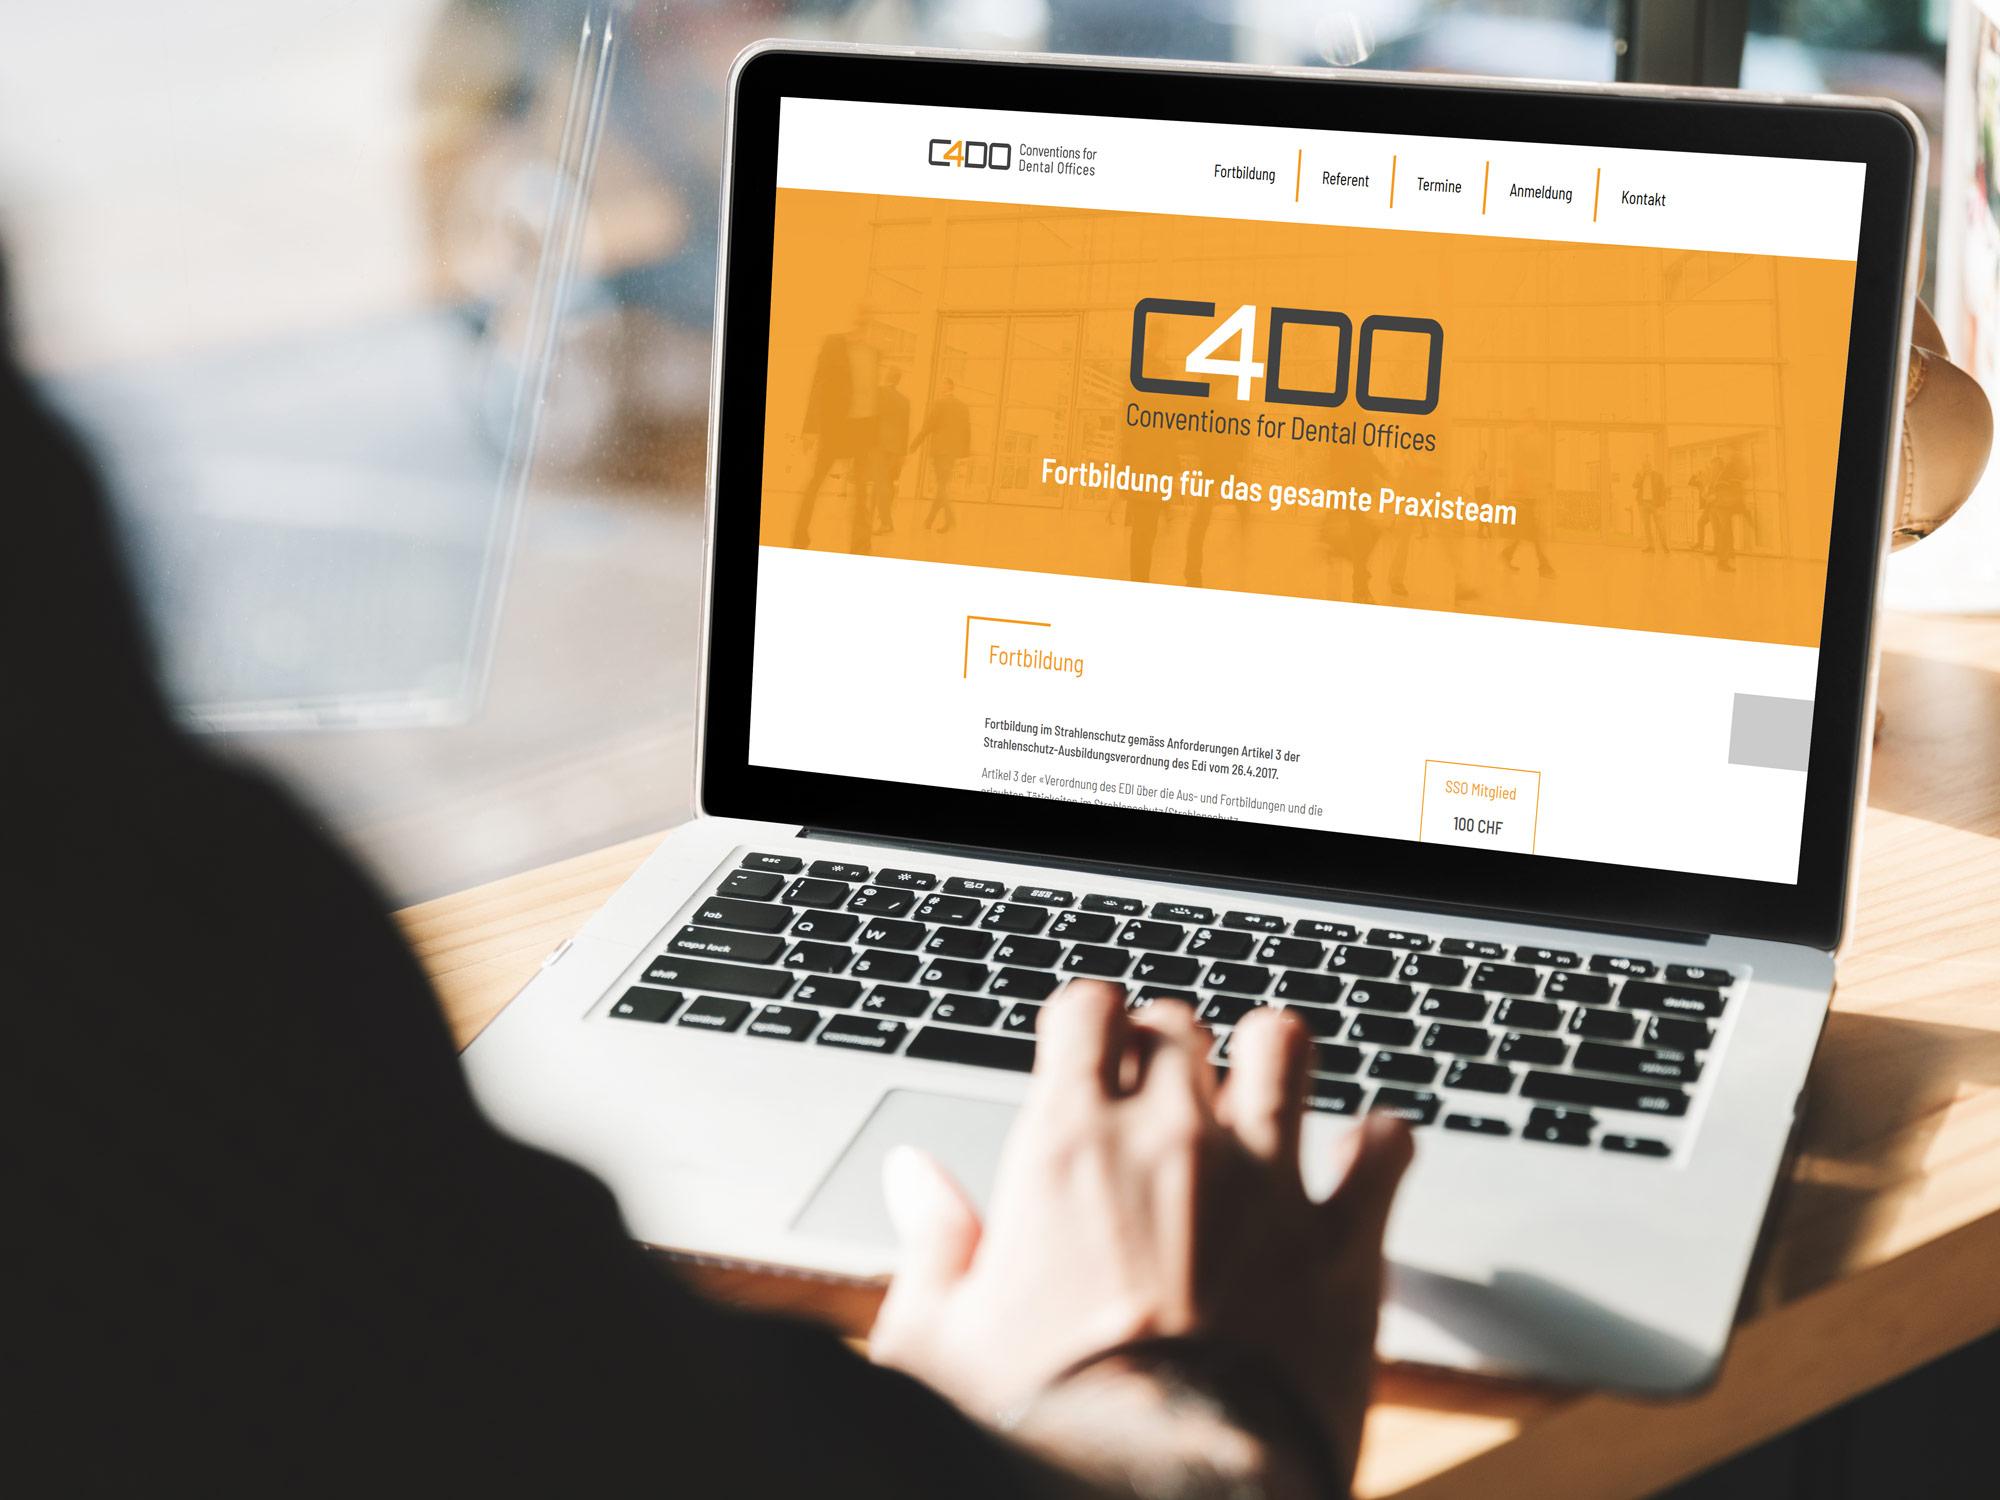 C4DO Webseite